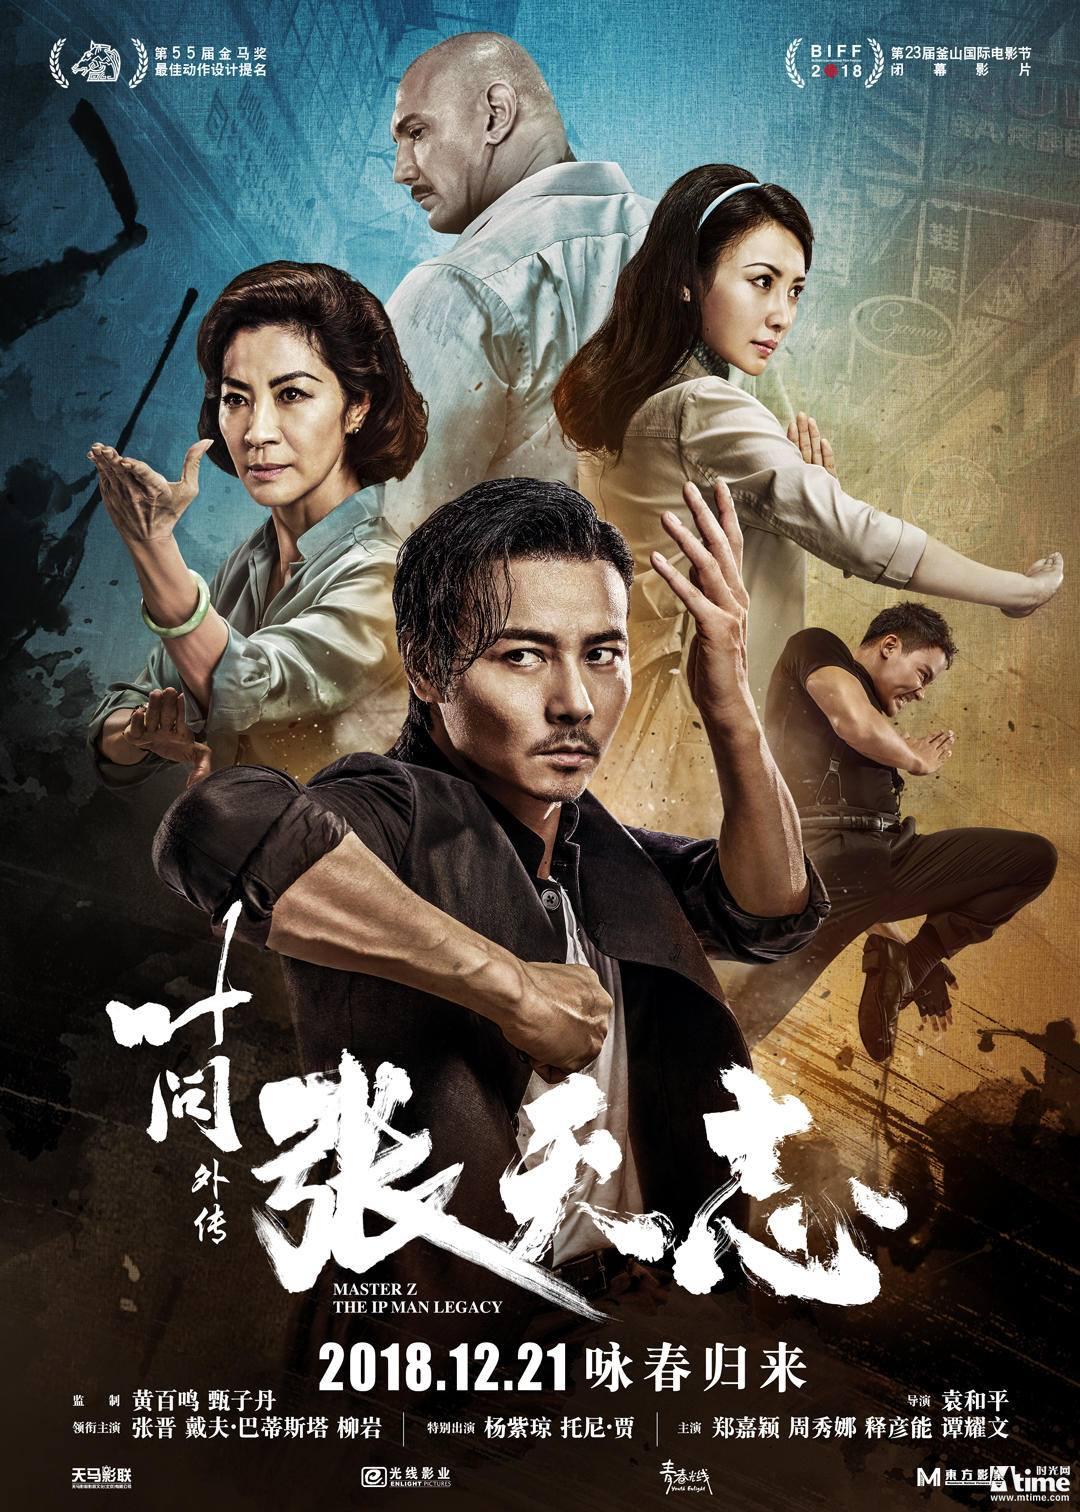 Poster For Yuen Woo Ping S Master Z Ip Man Legacy Starring Max